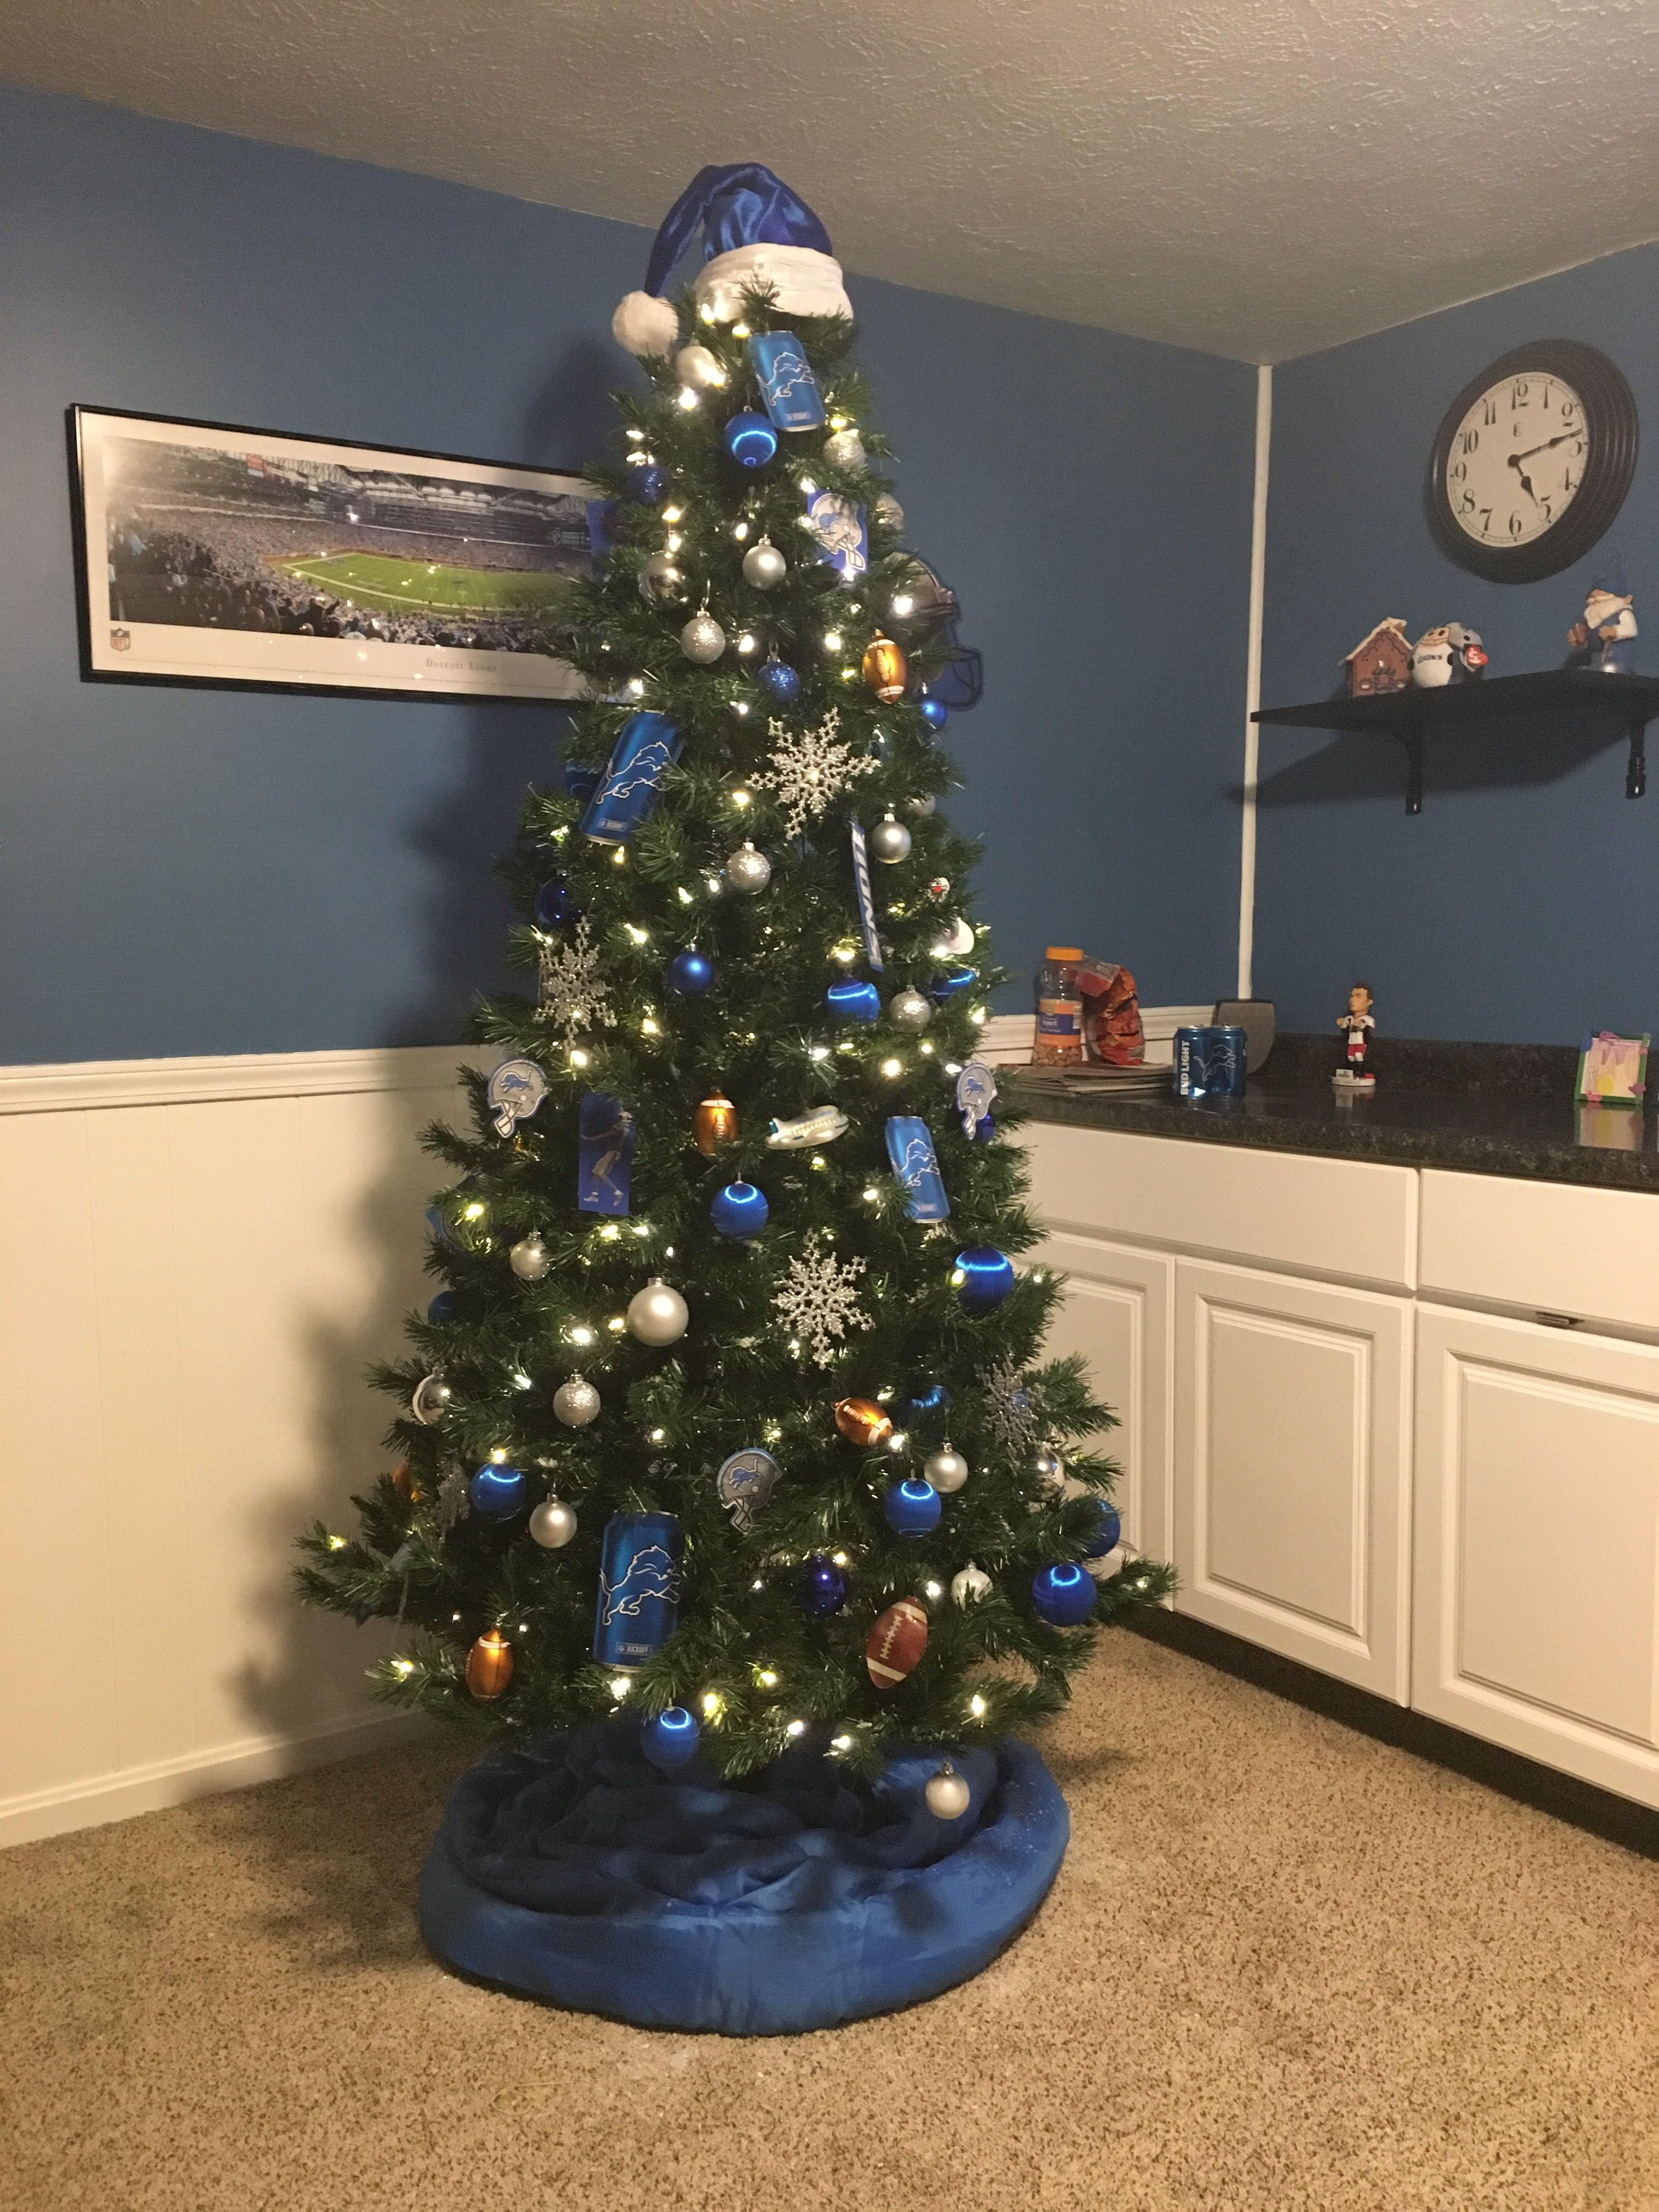 ea8e61be Tim's Detroit Lions Christmas Tree | Detroit lions | Detroit lions ...